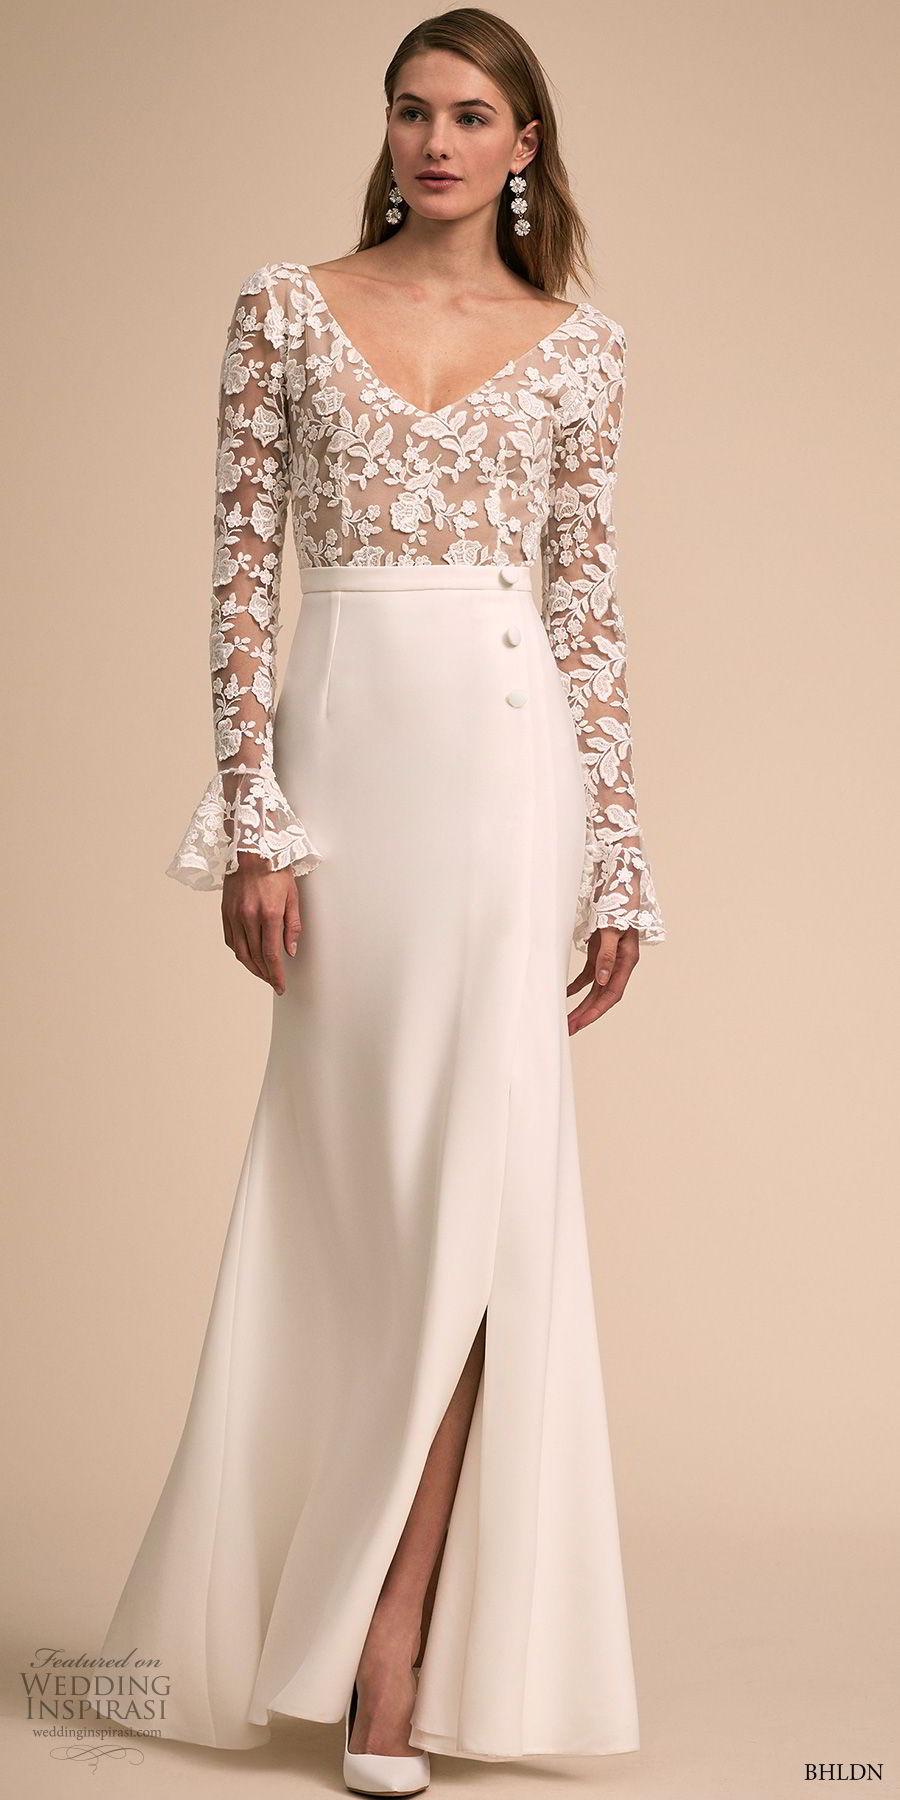 bhldn 2018 bridal long poet sleeves v neck heavily embellished bodice slit skirt elegant modified a line wedding scoop back dress sweep train (3) mv